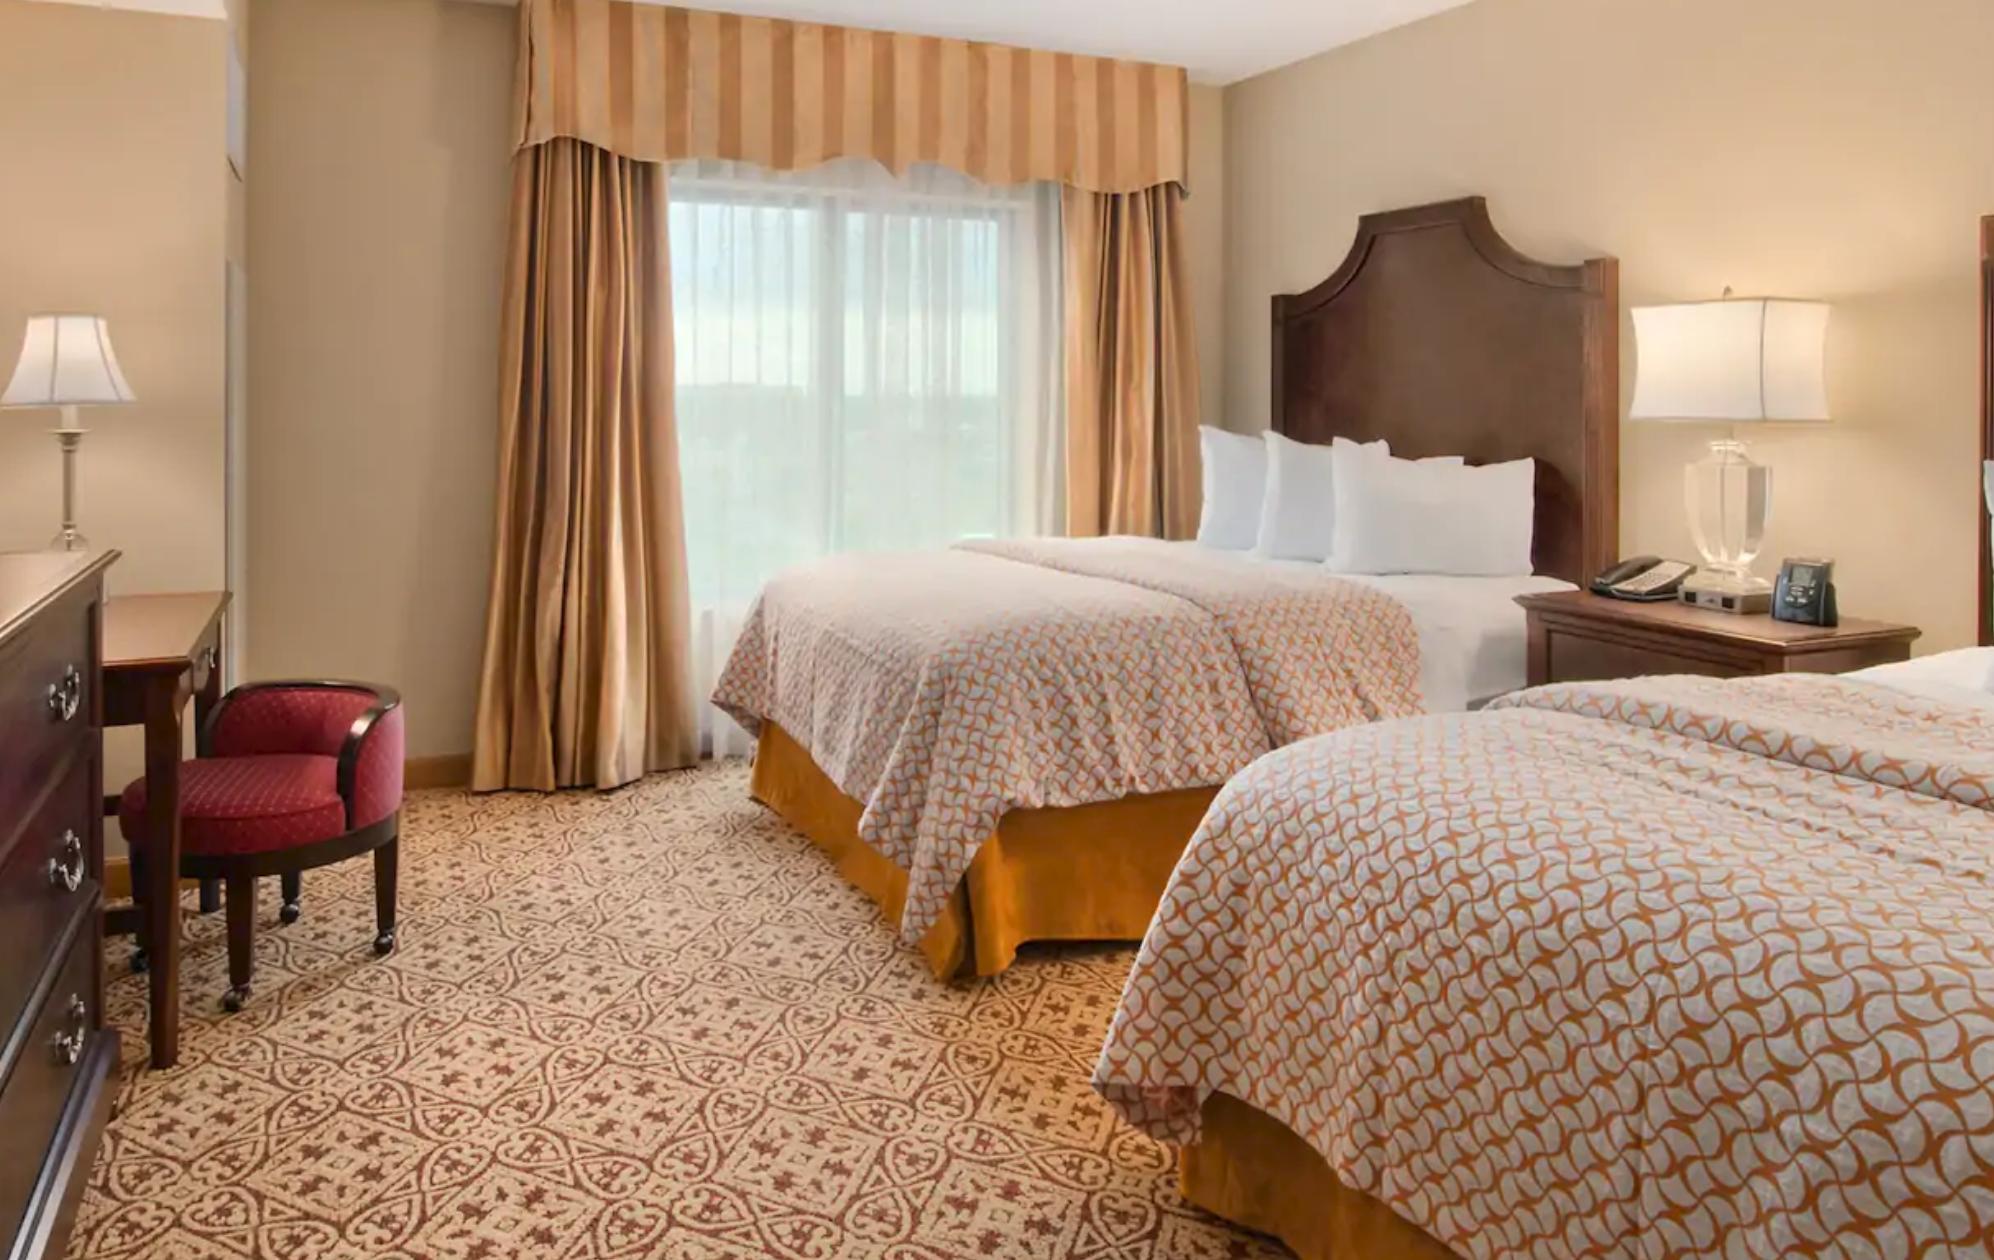 https://www.hotelsbyday.com/_data/default-hotel_image/4/20551/screenshot-2020-08-14-at-12-39-06-pm.png